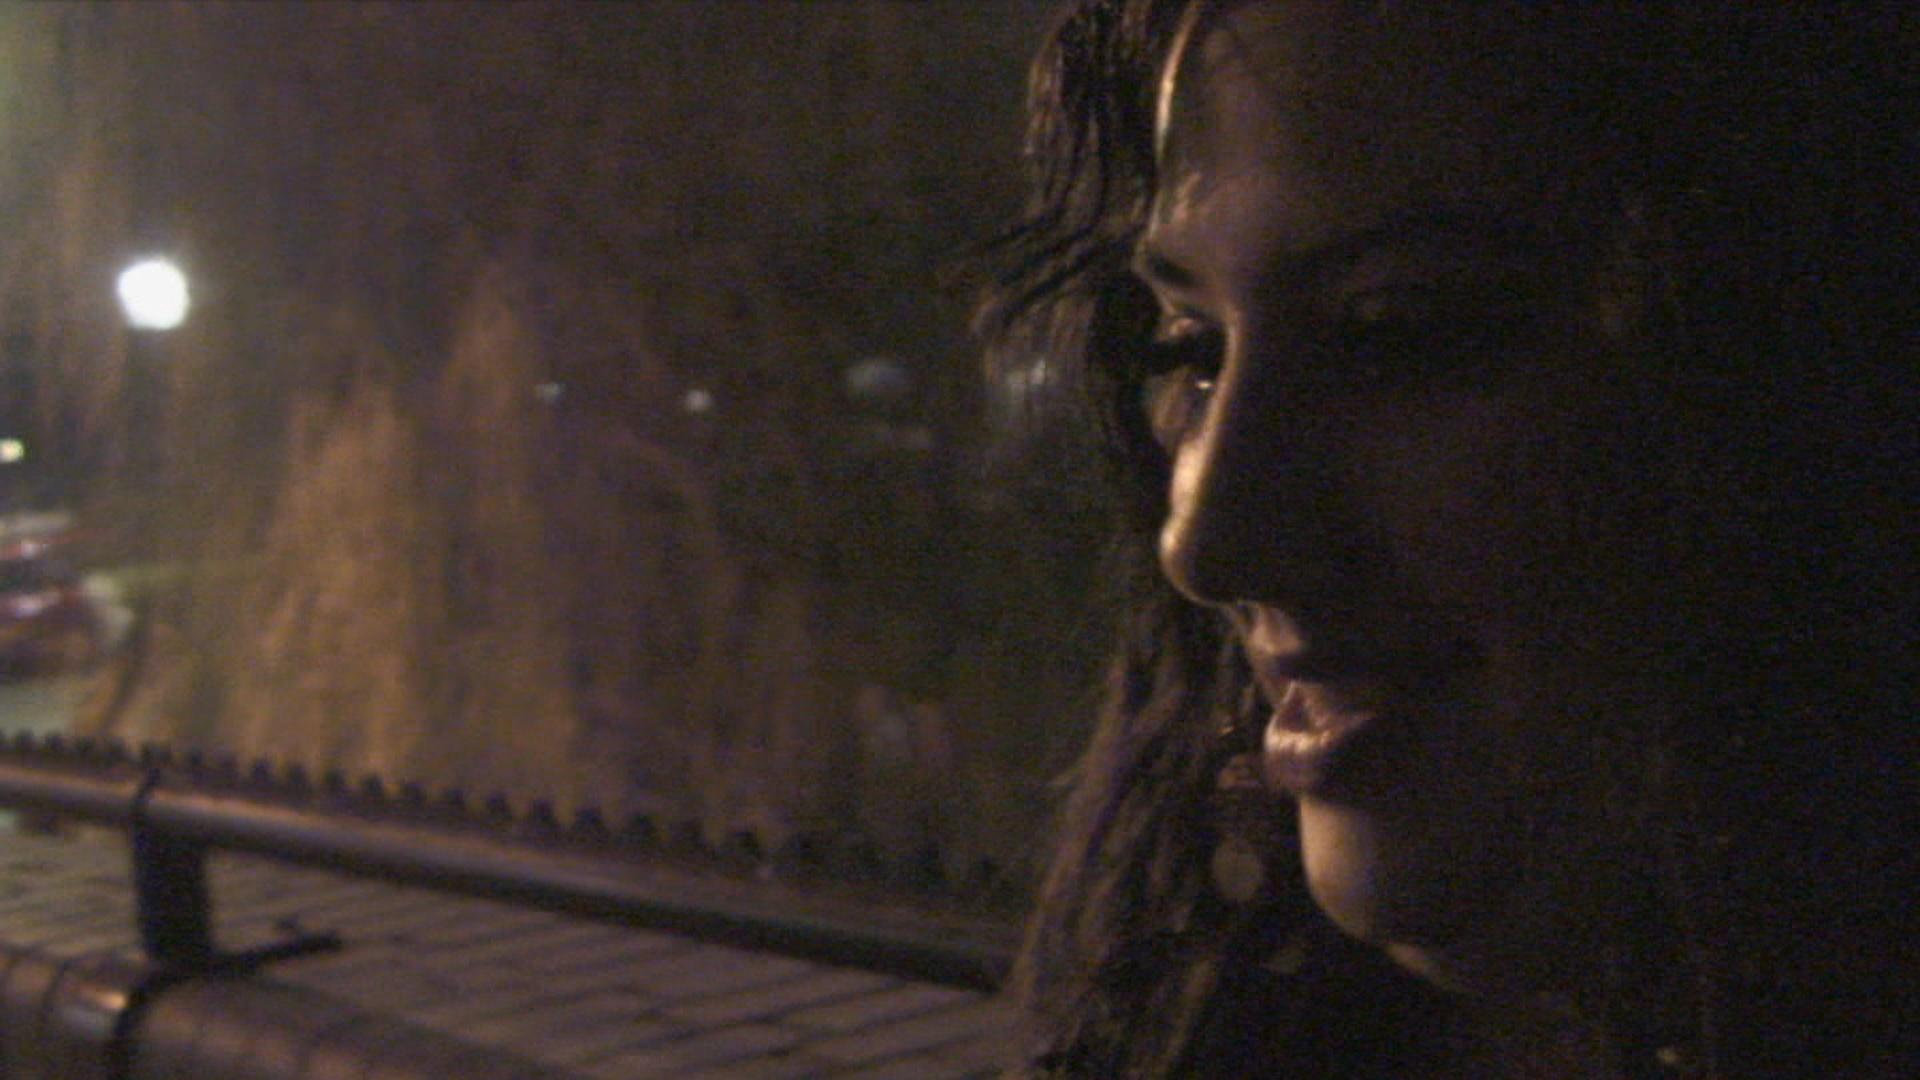 Rohan Quine, 'The Imagination Thief' - film 'EVELYN 62-39-32-84-100', still 19